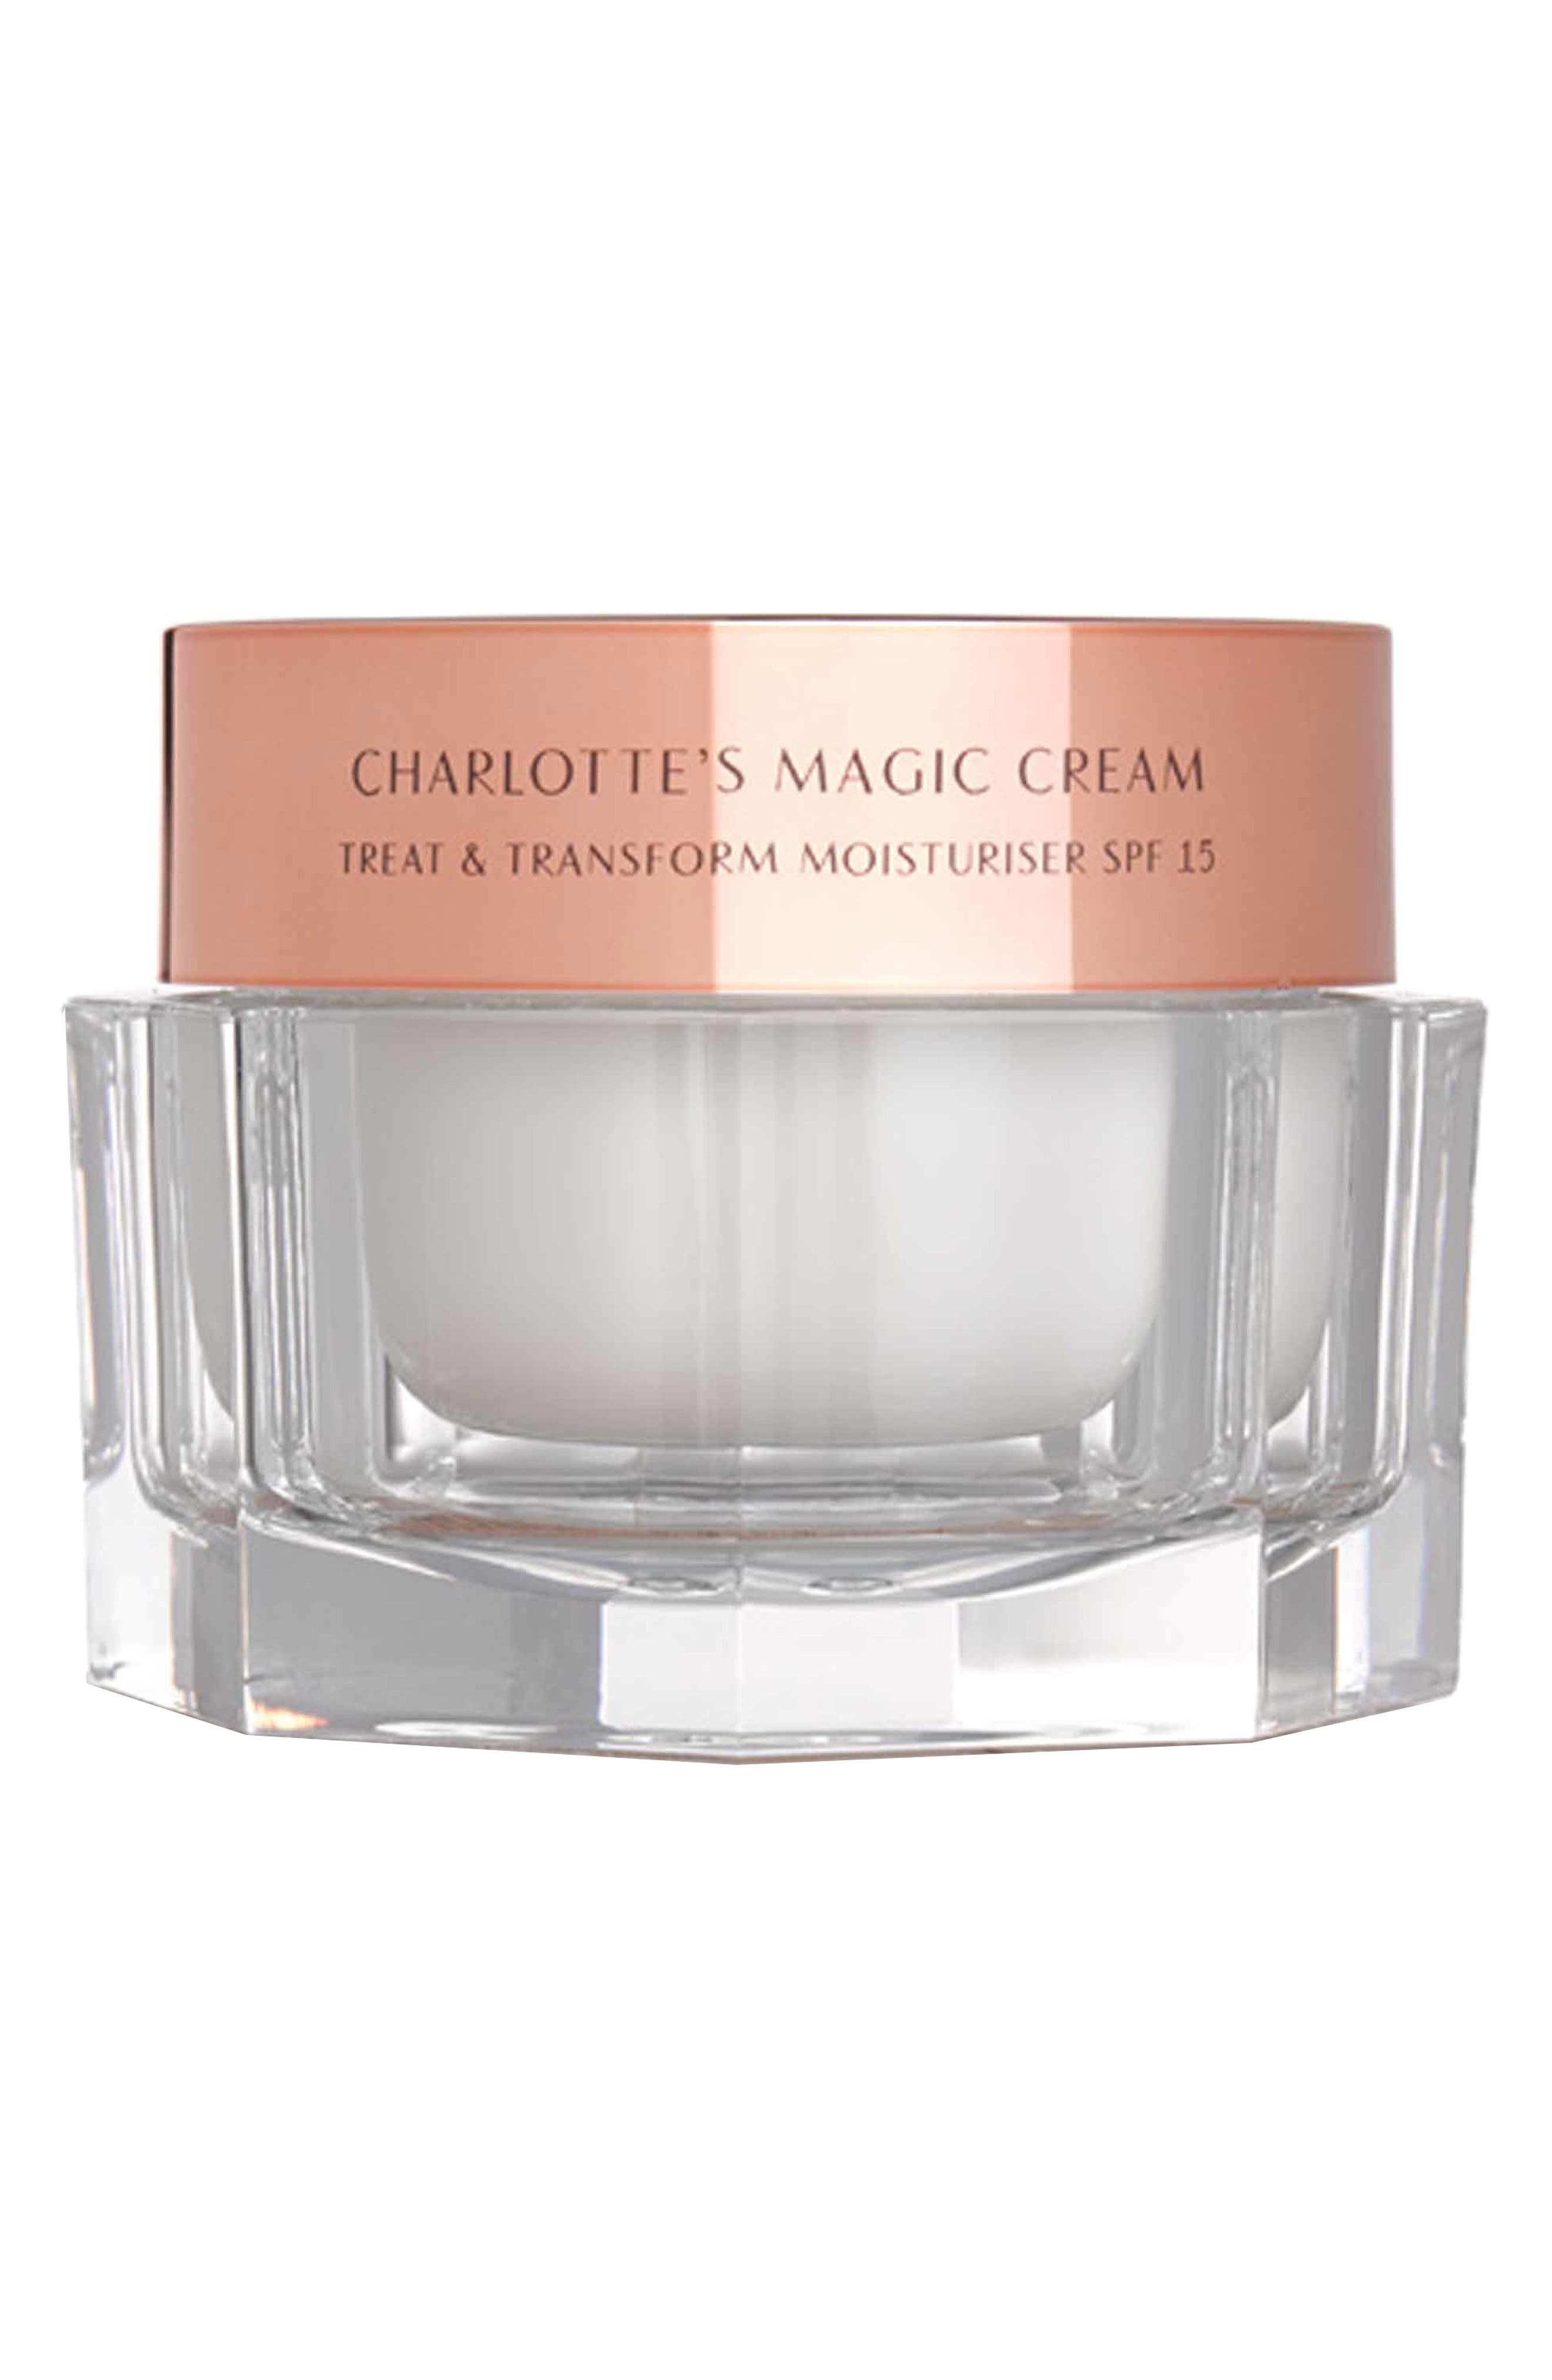 CHARLOTTE TILBURY, Charlottes Magic Cream, Main thumbnail 1, color, NO COLOR